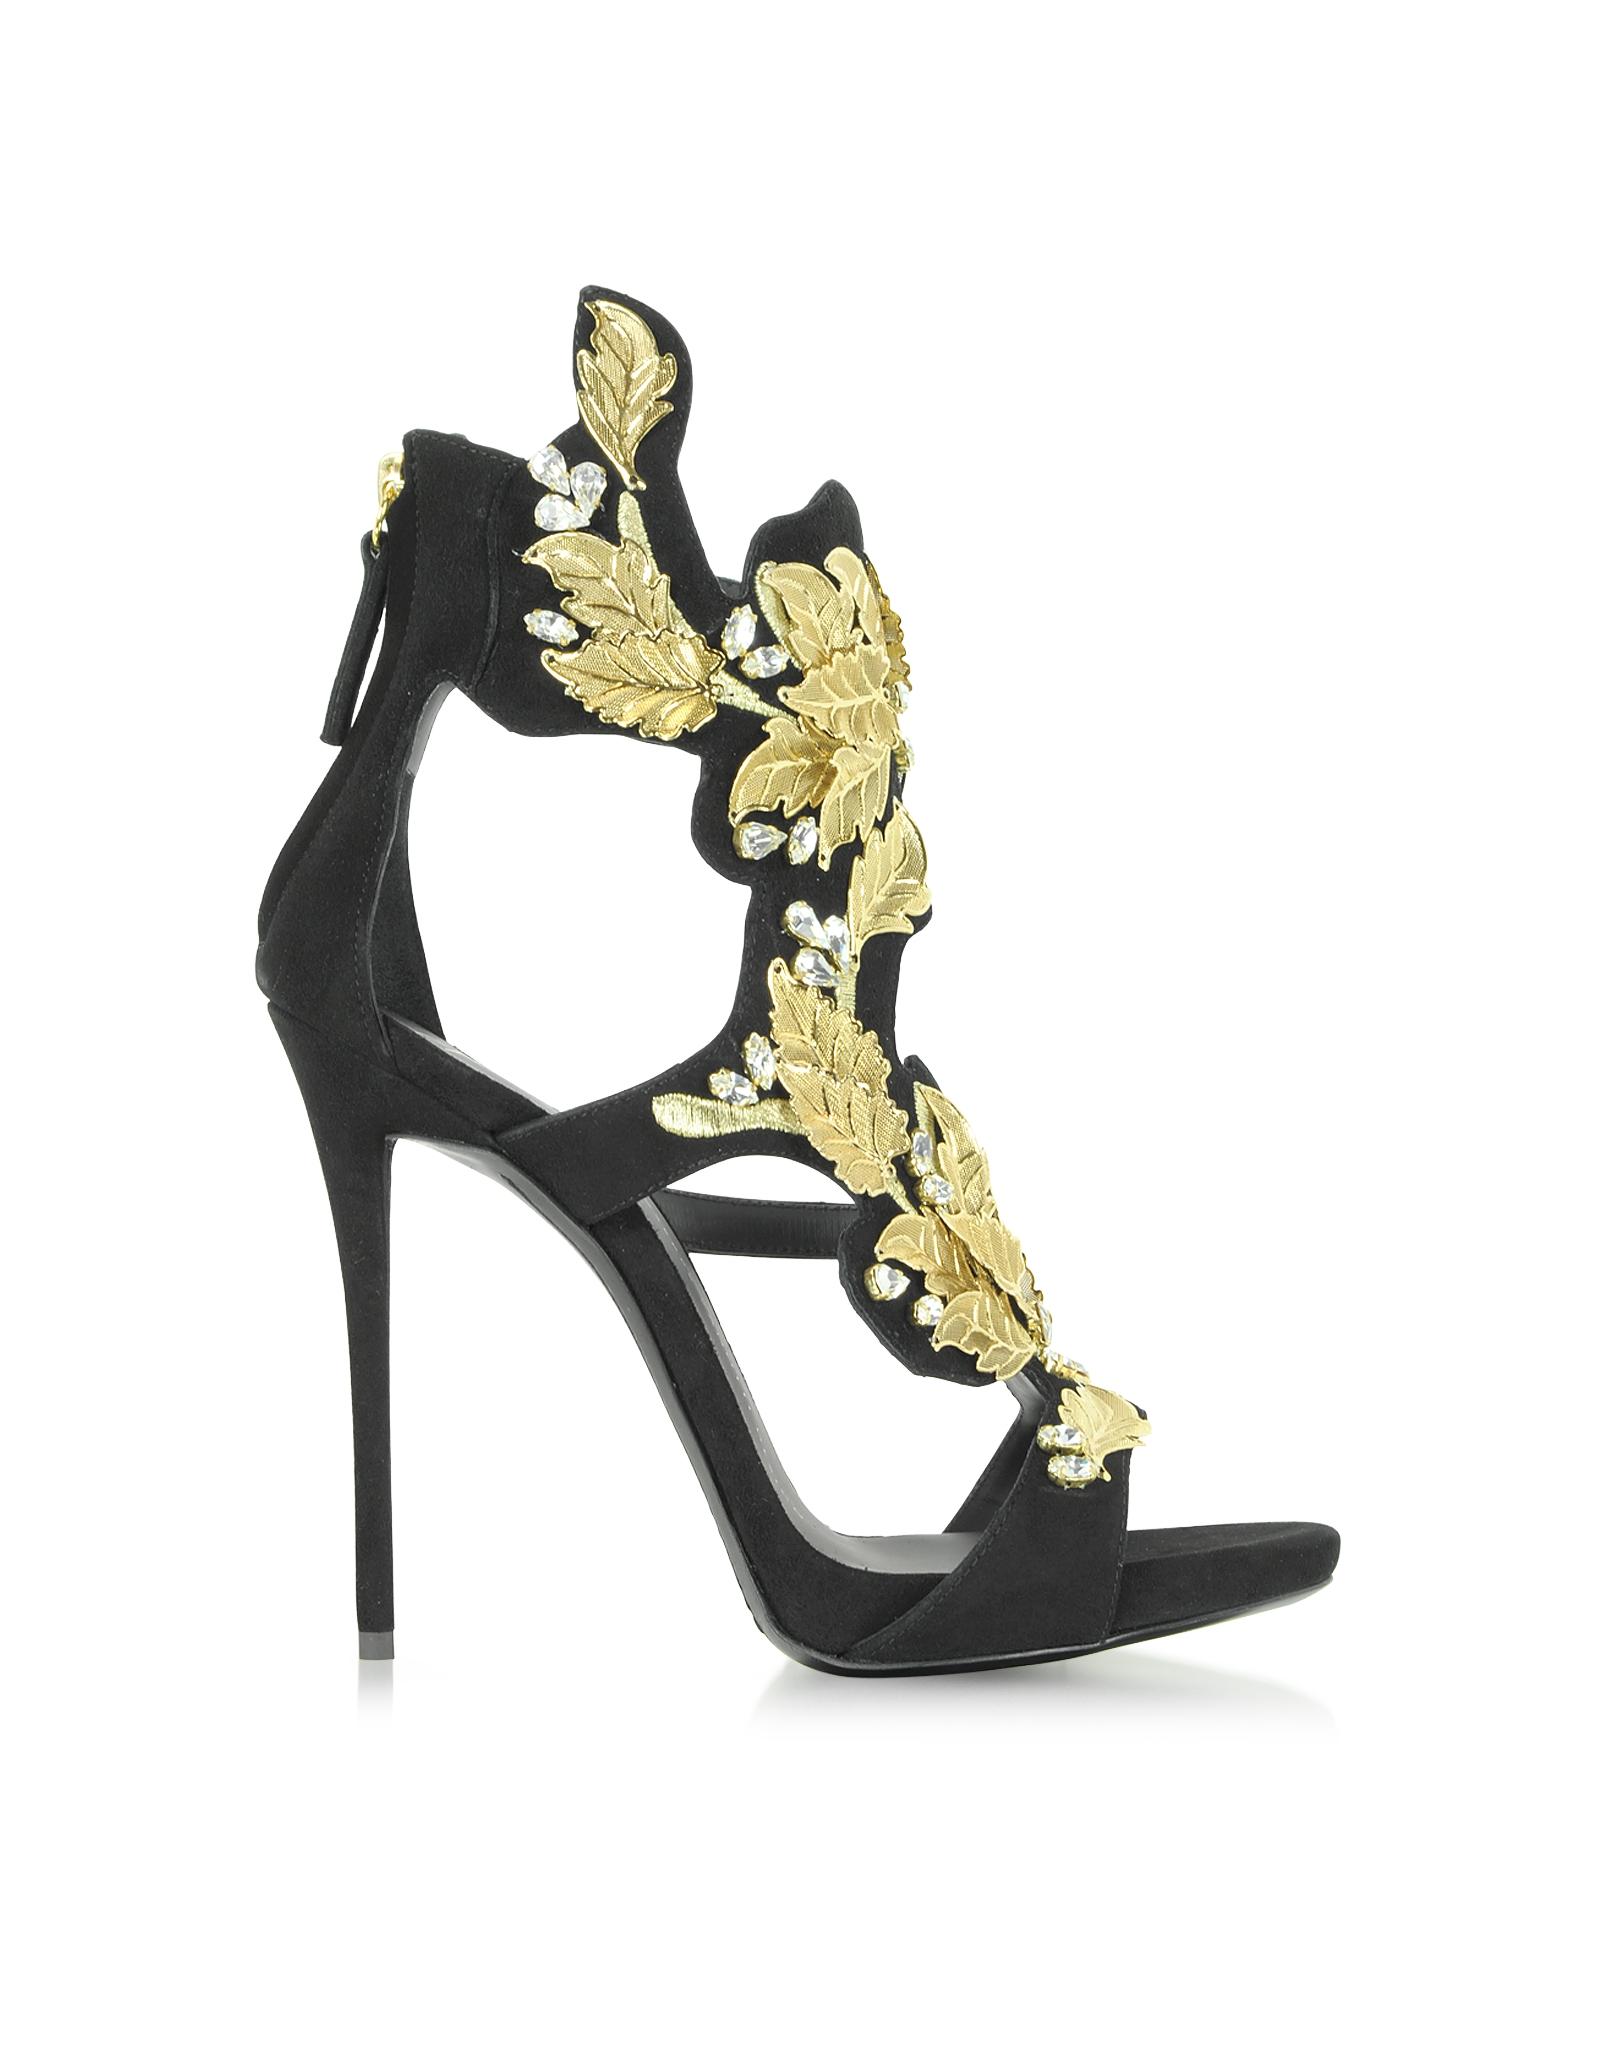 Lyst Giuseppe Zanotti Black Suede High Heel Sandal W